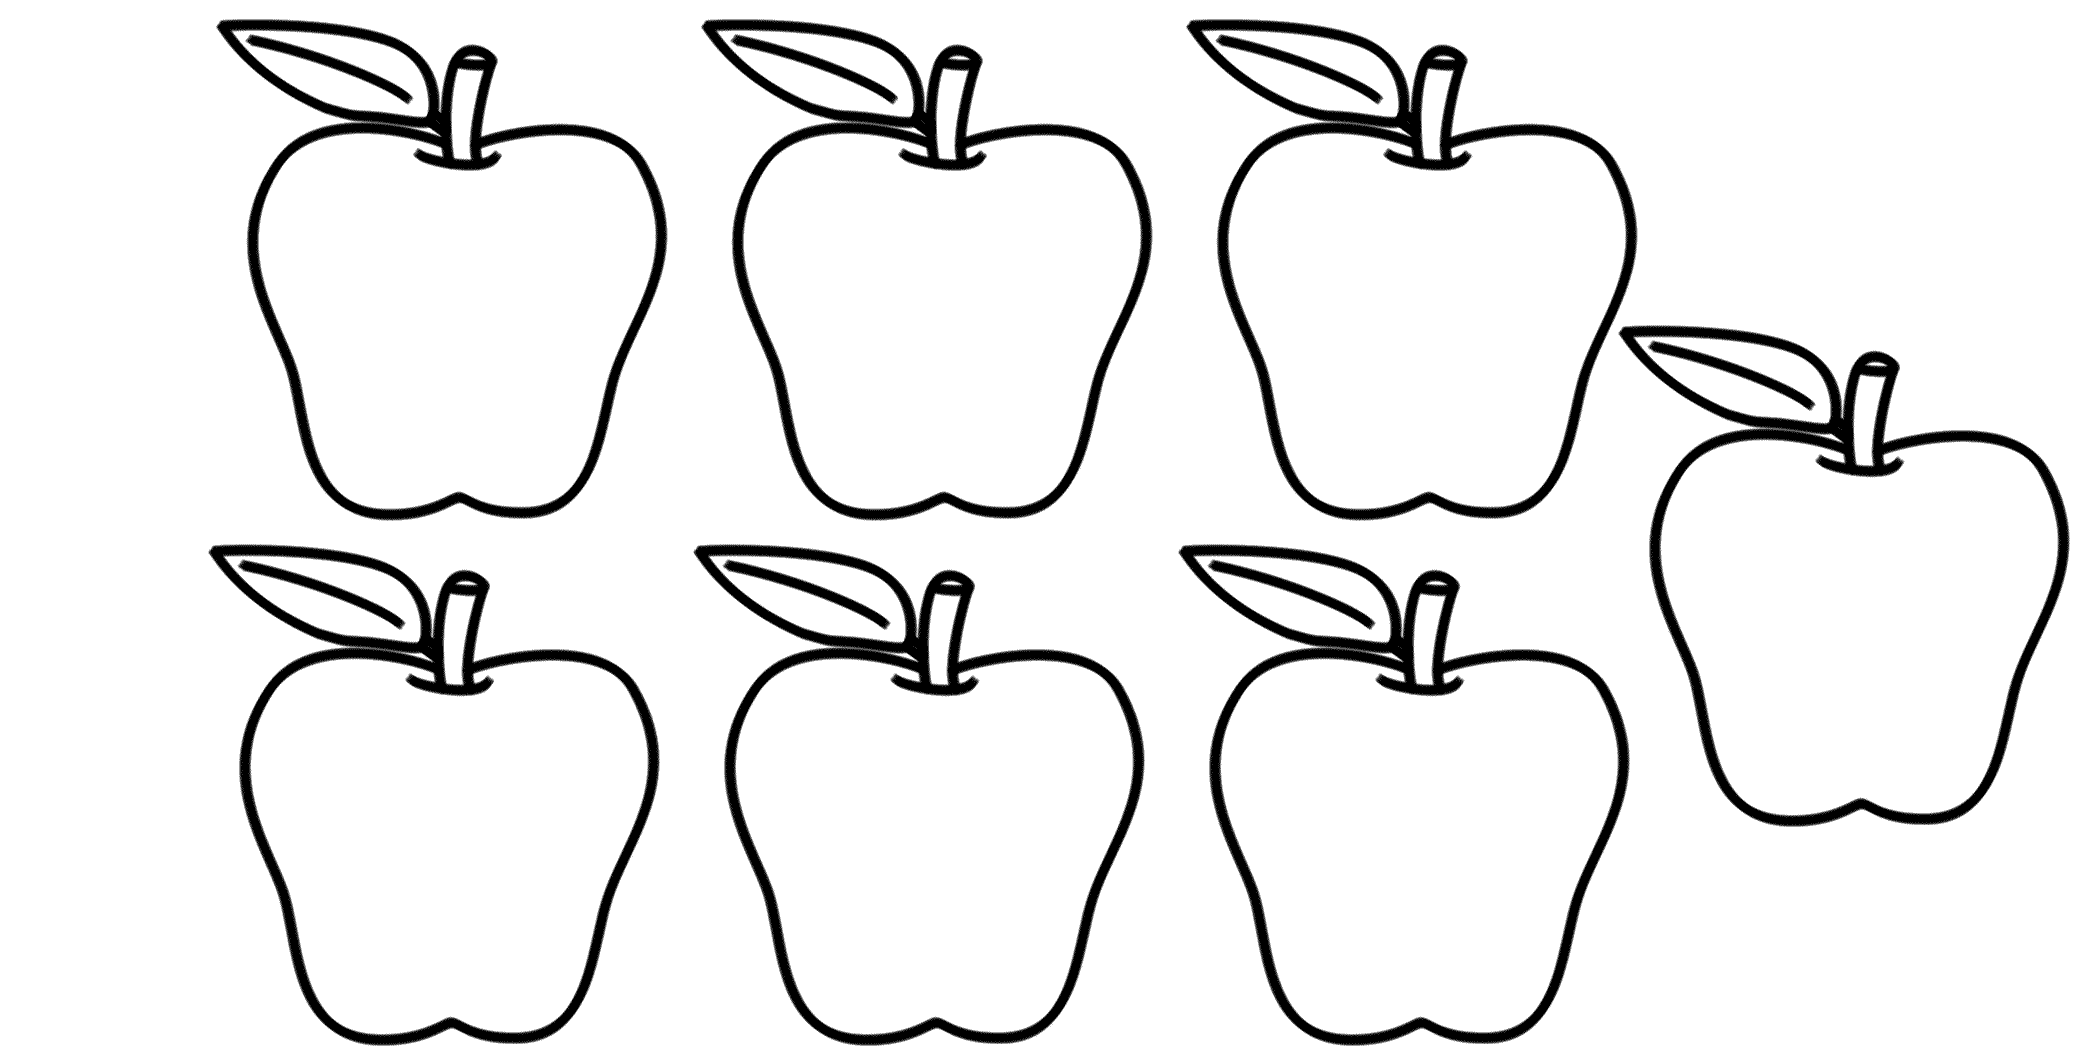 Apple clipart seven Worksheet  Printing 7 Number